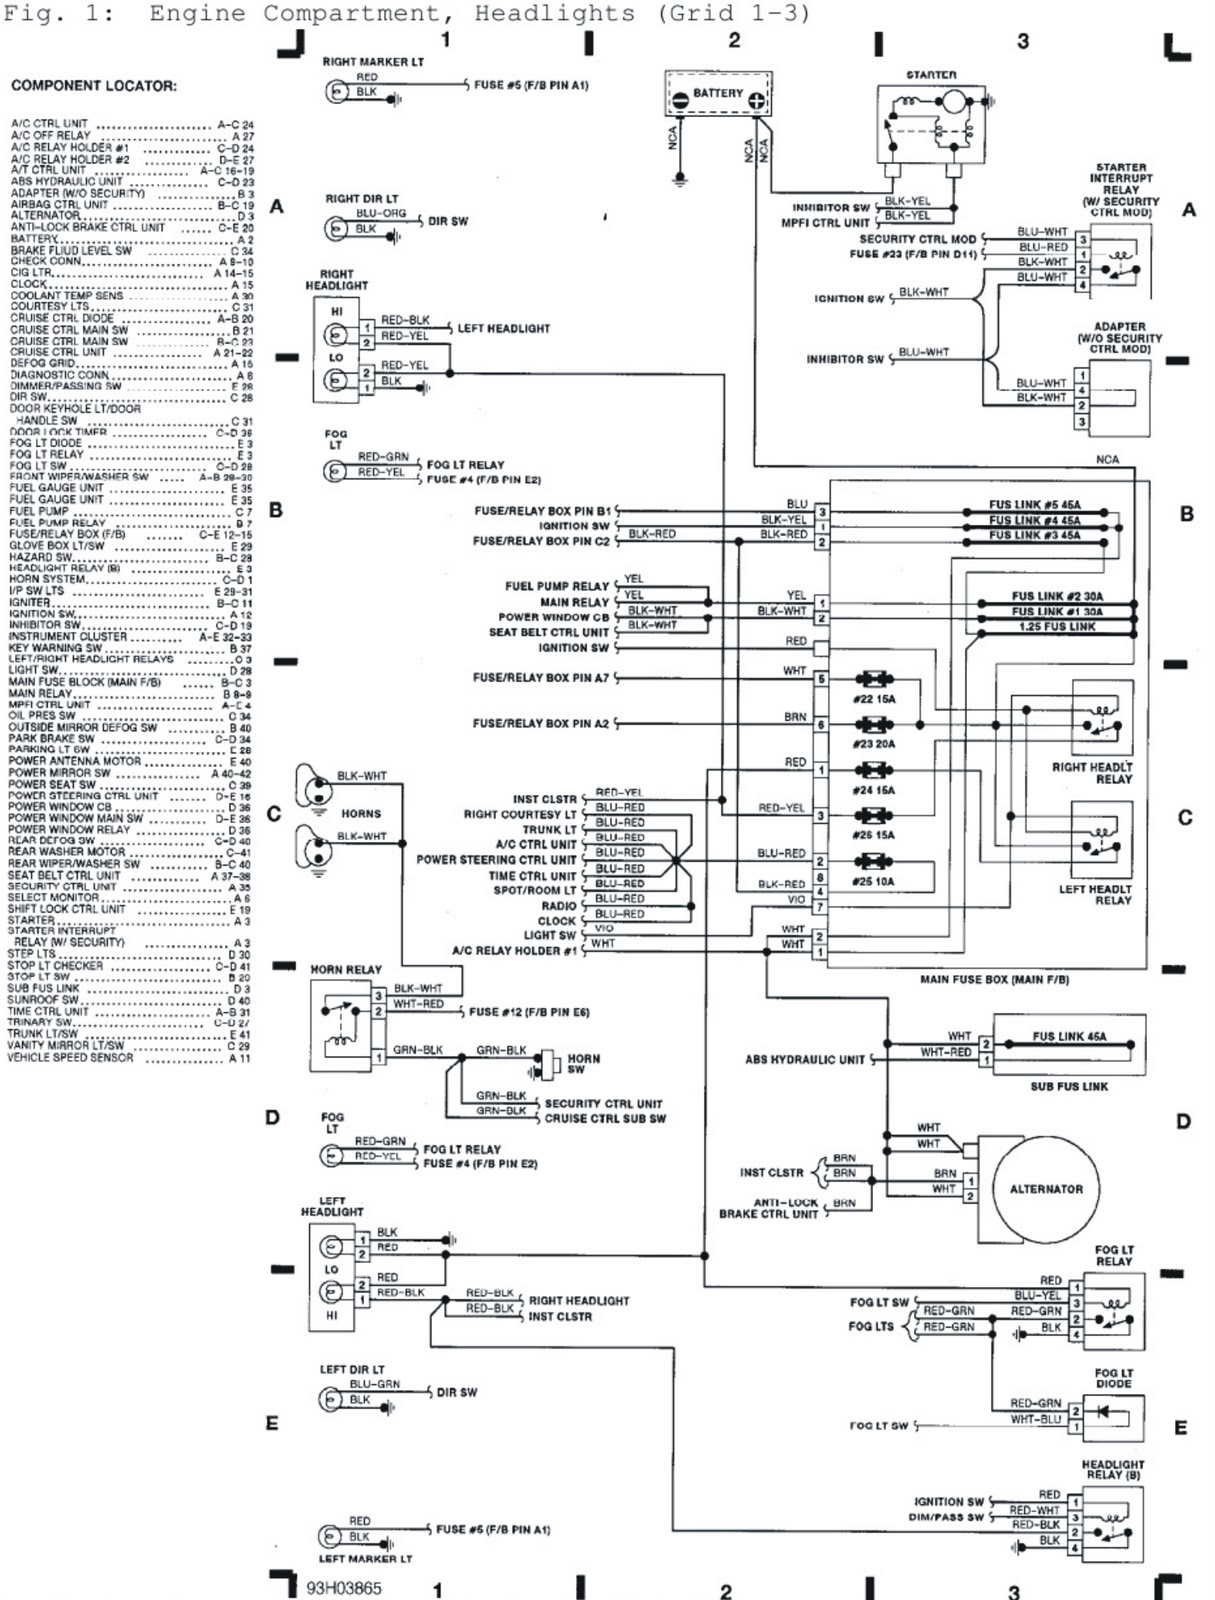 V Manual: 1992 Subaru SVX Engine Compartment, Headlights